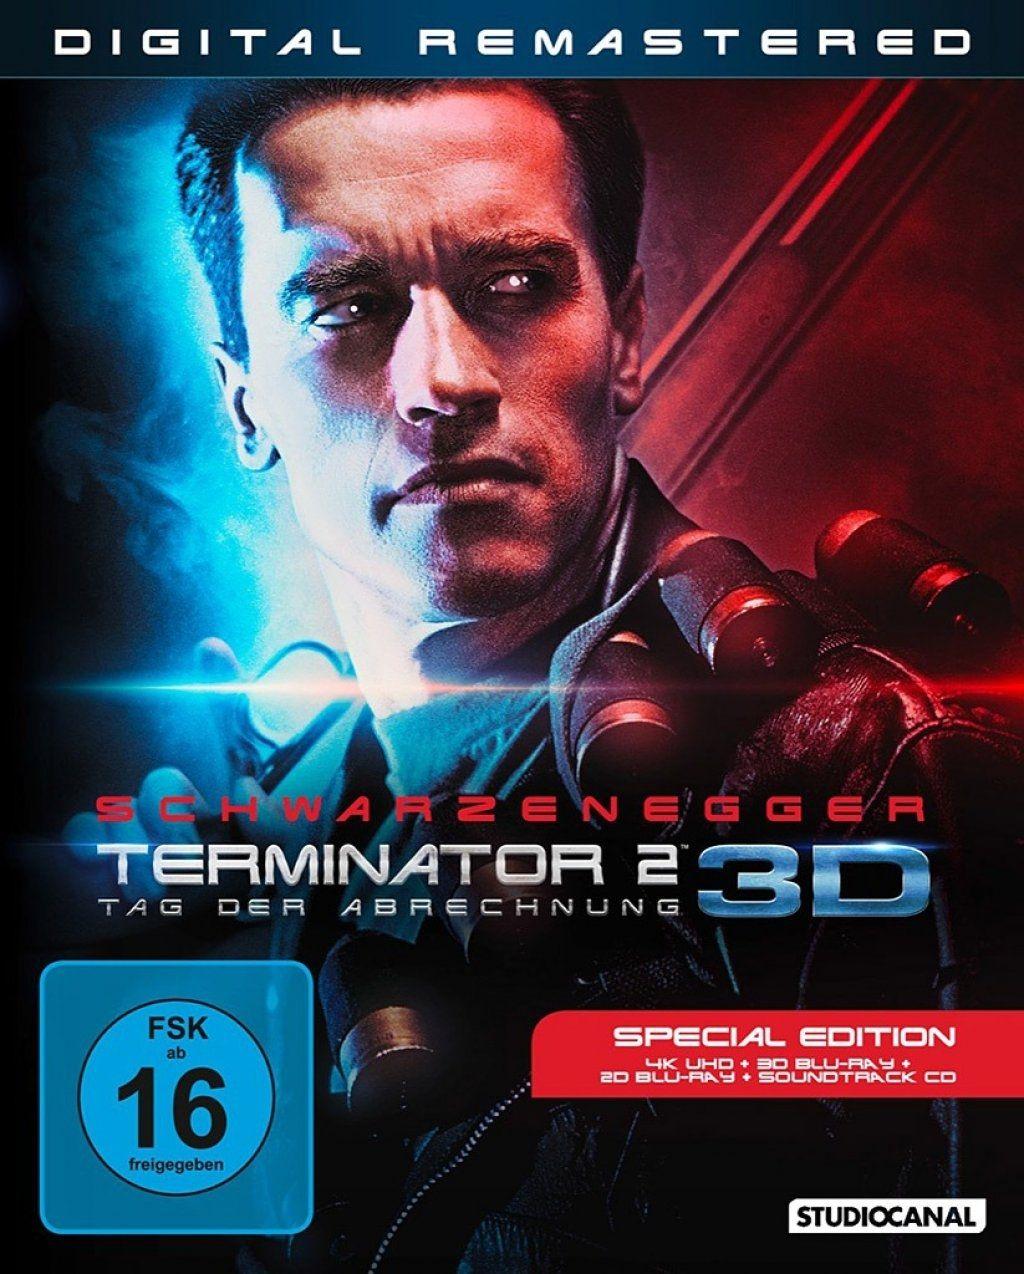 Terminator 2 - Tag der Abrechnung (4 Discs) (UHD BLURAY + BLURAY + BLURAY 3D)